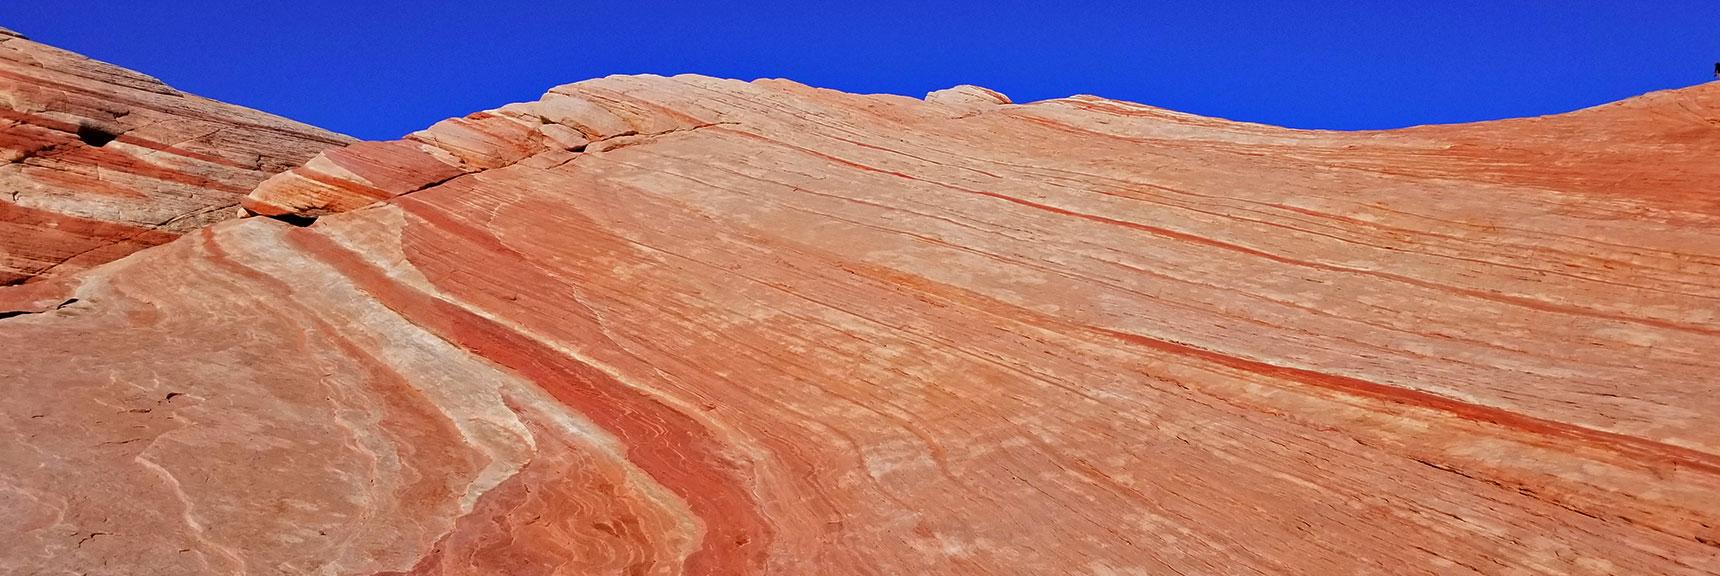 Firewave in Valley of Fire State Park, Nevada, Slide 015